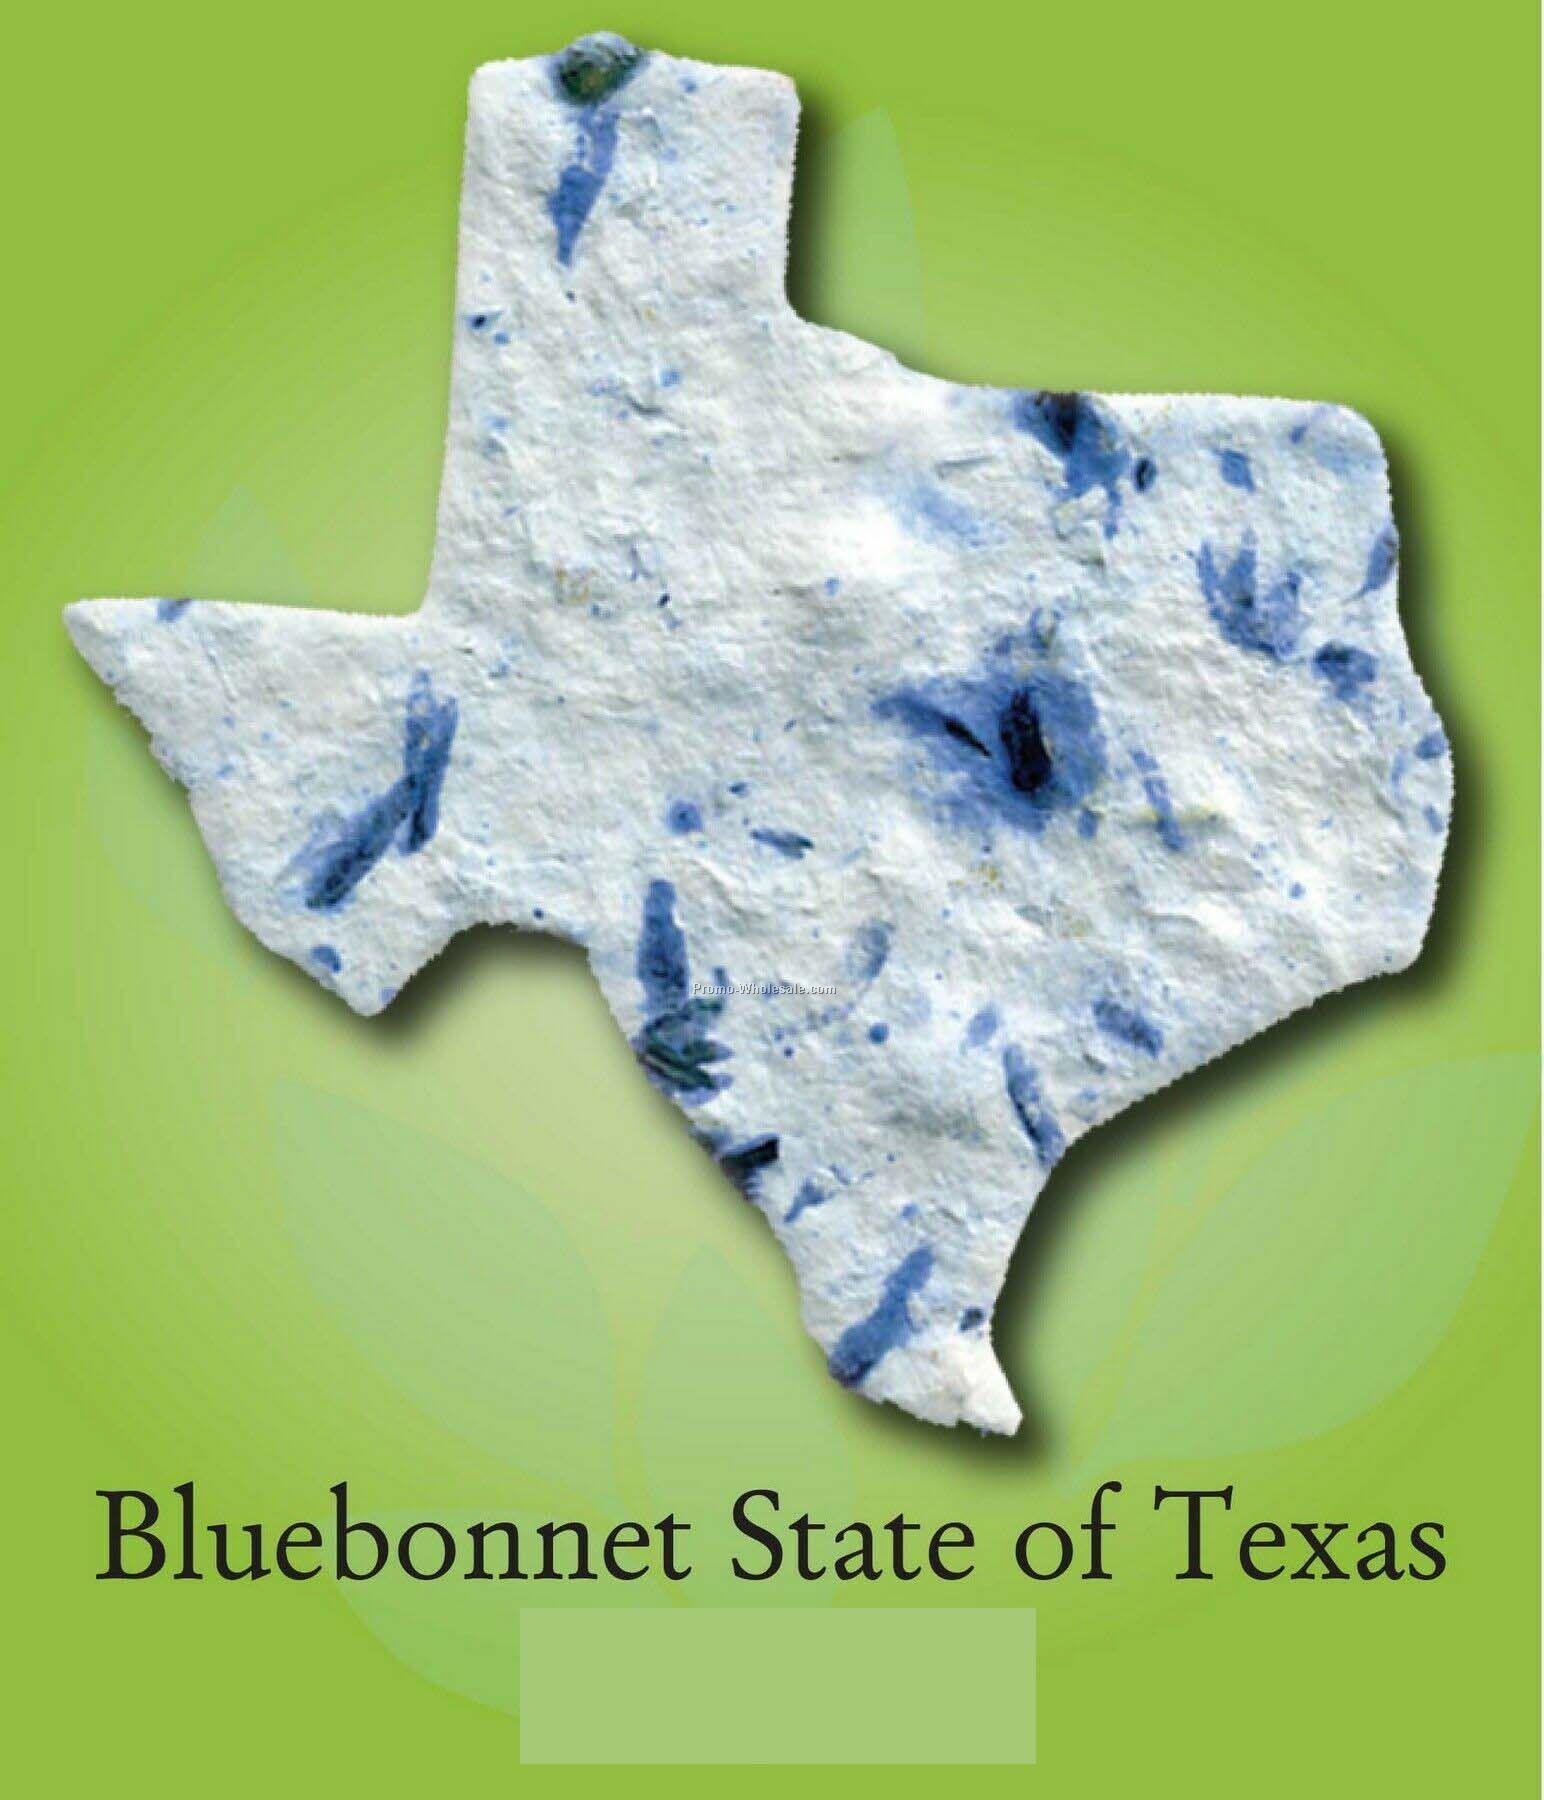 Texas Bluebonnet State Flower